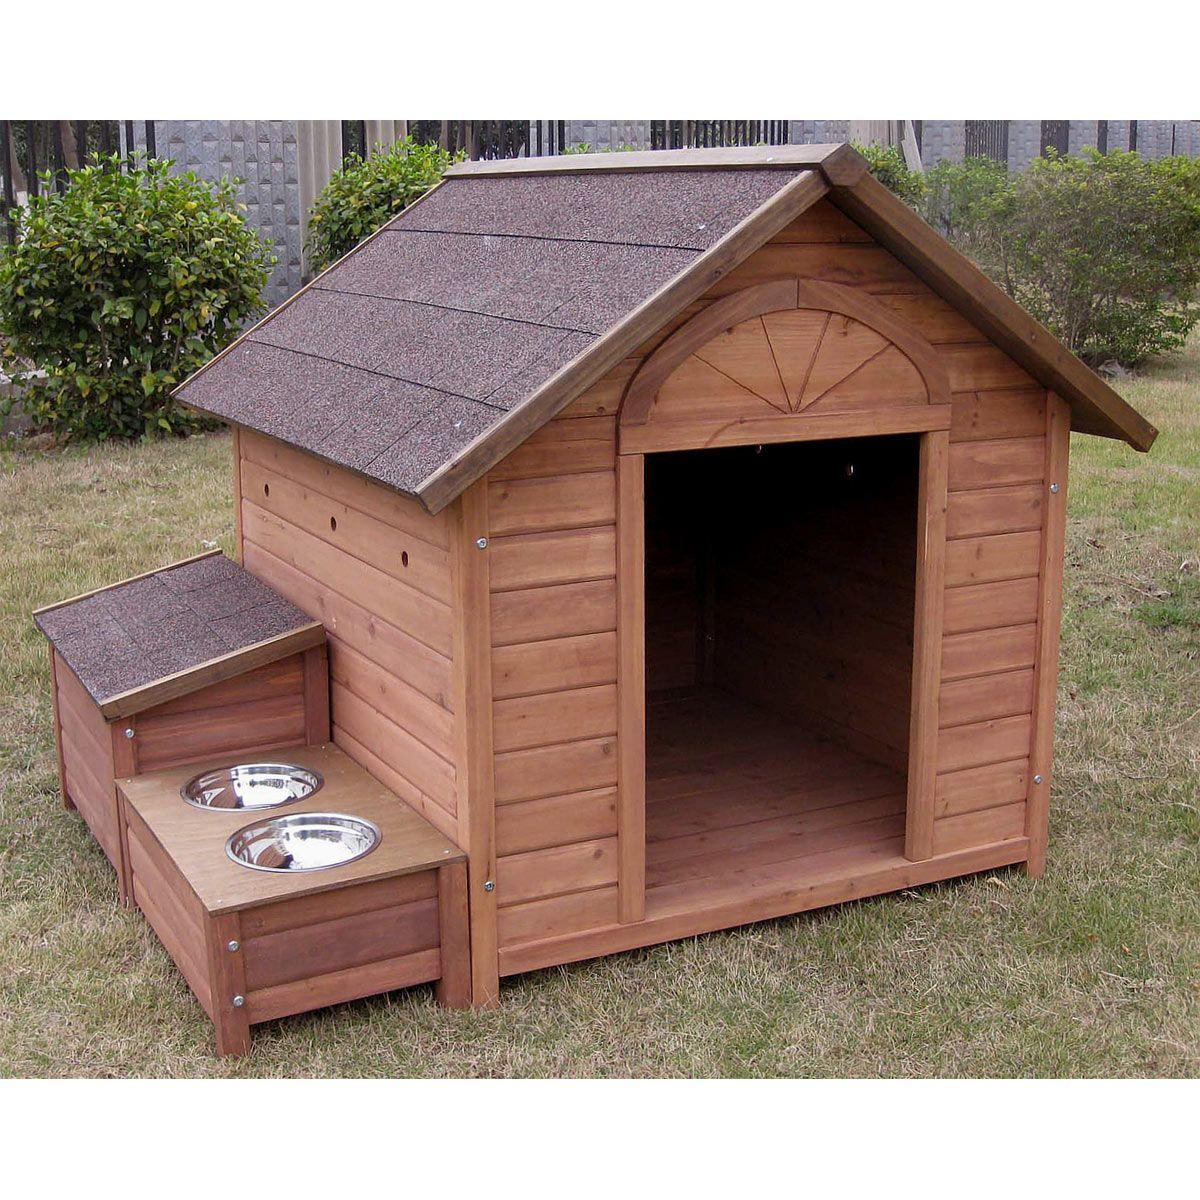 niche pour chien recherche google vie de chien pinterest niche niche chien et niche. Black Bedroom Furniture Sets. Home Design Ideas